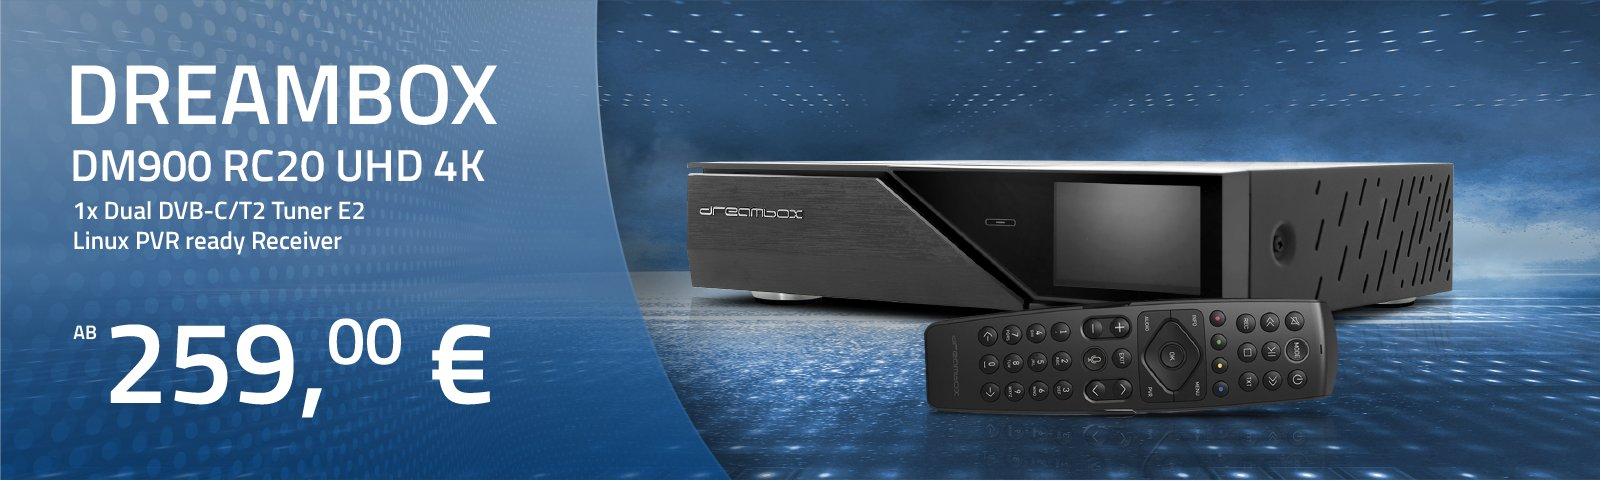 https://www.hm-sat-shop.de/dreambox/dm900-uhd/2063/dreambox-dm900-rc20-uhd-4k-1x-dual-dvb-s2x-ms-tuner-e2-linux-pvr-ready-receiver?c=19